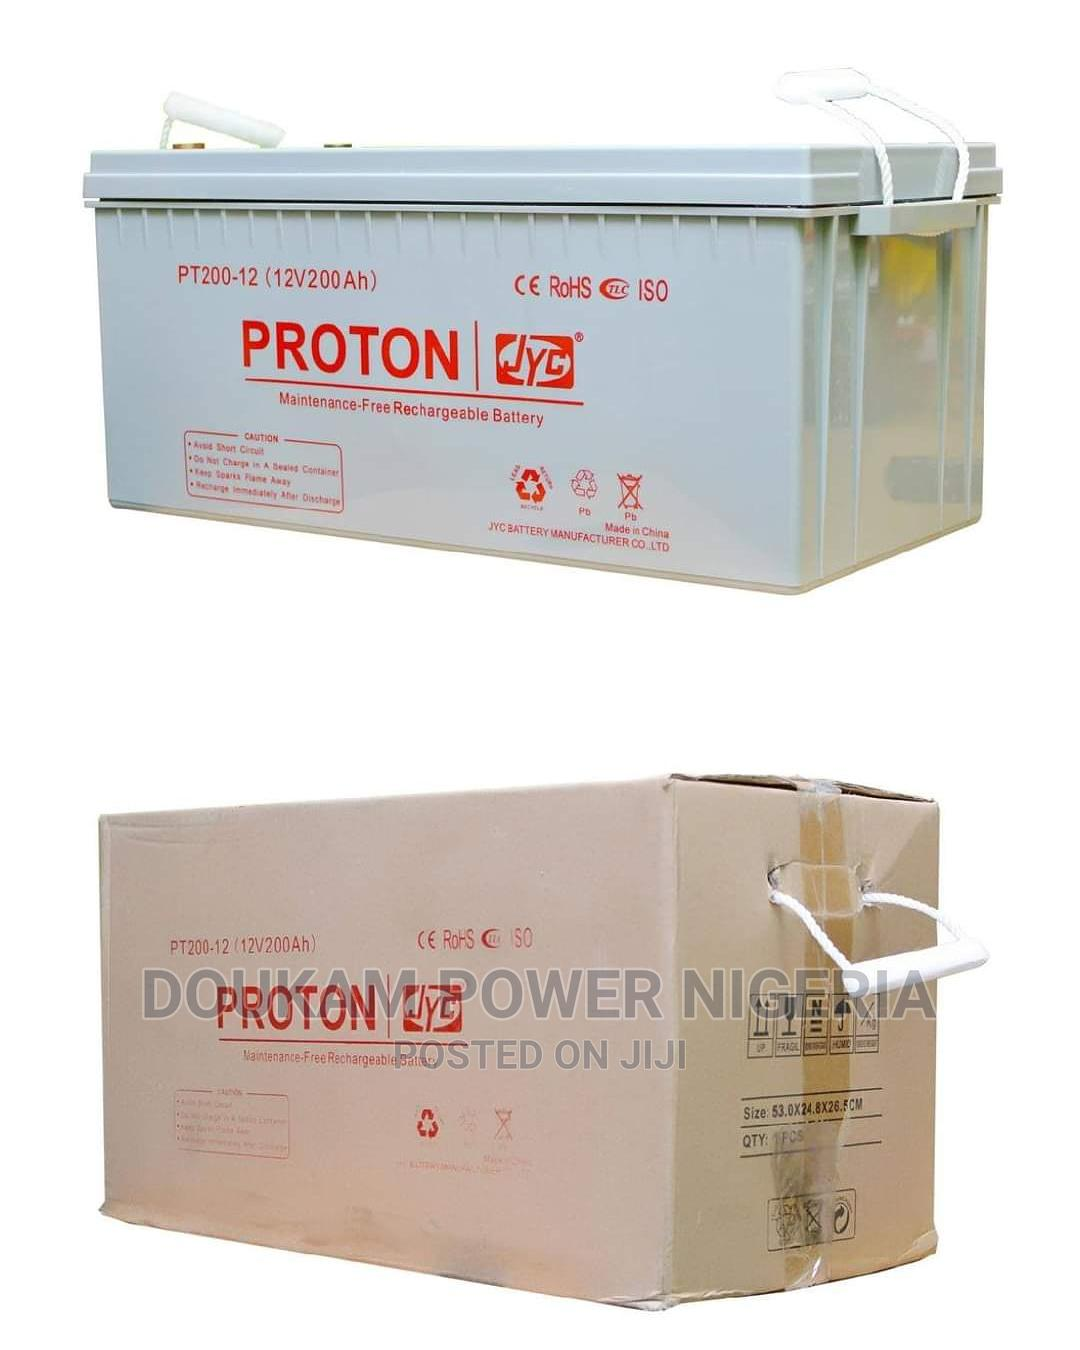 Proton Inverter Batteries 200AH